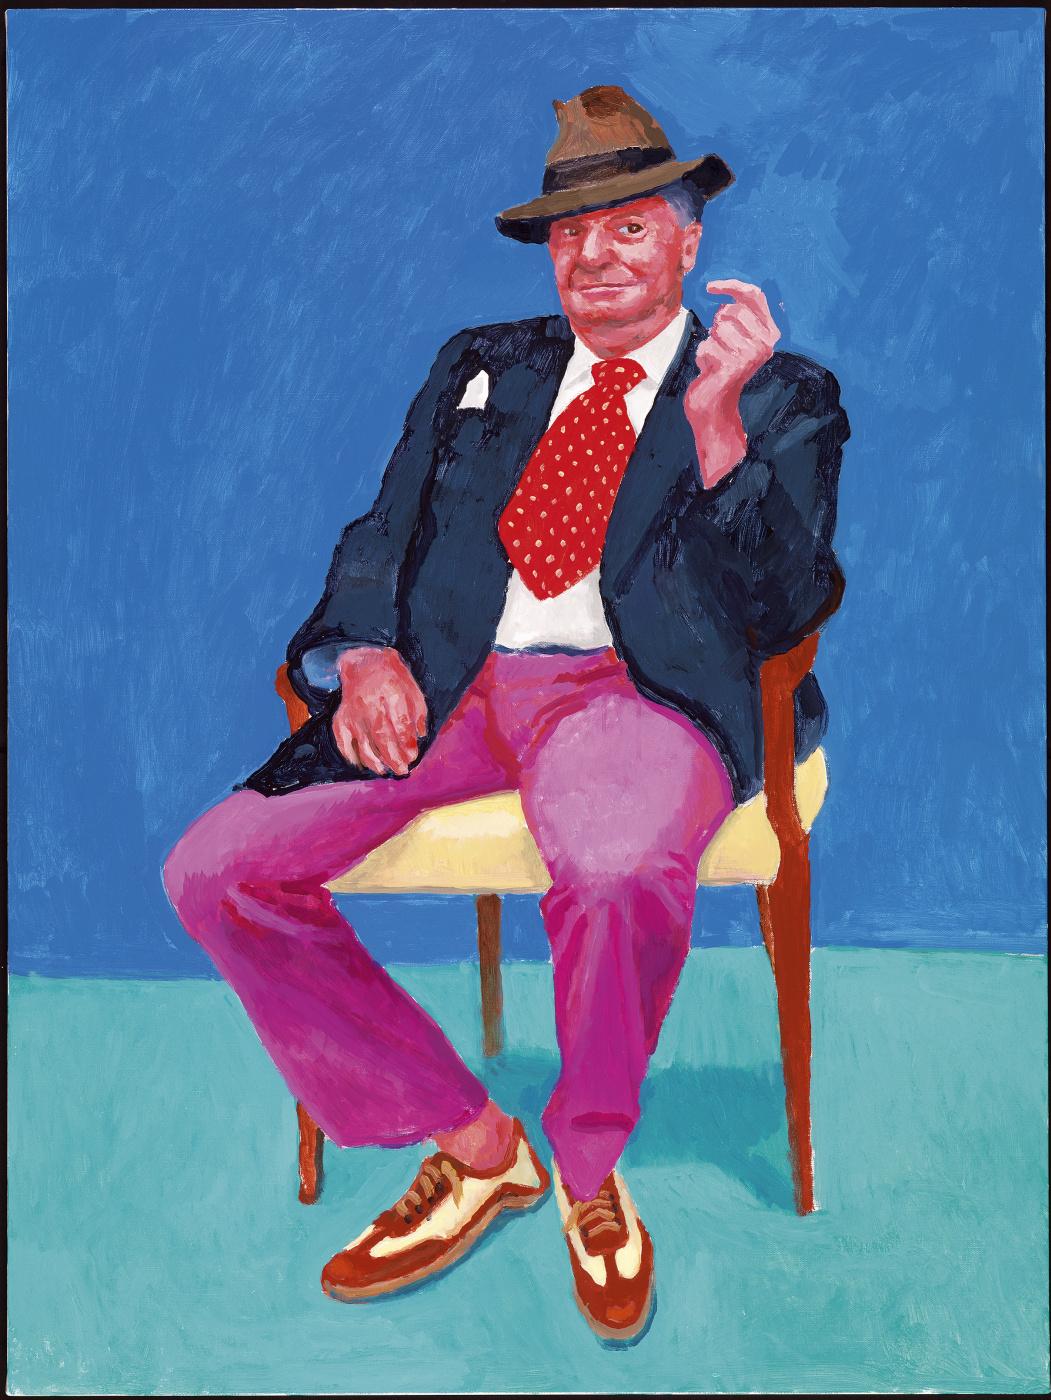 David Hockney. Barry Humphries